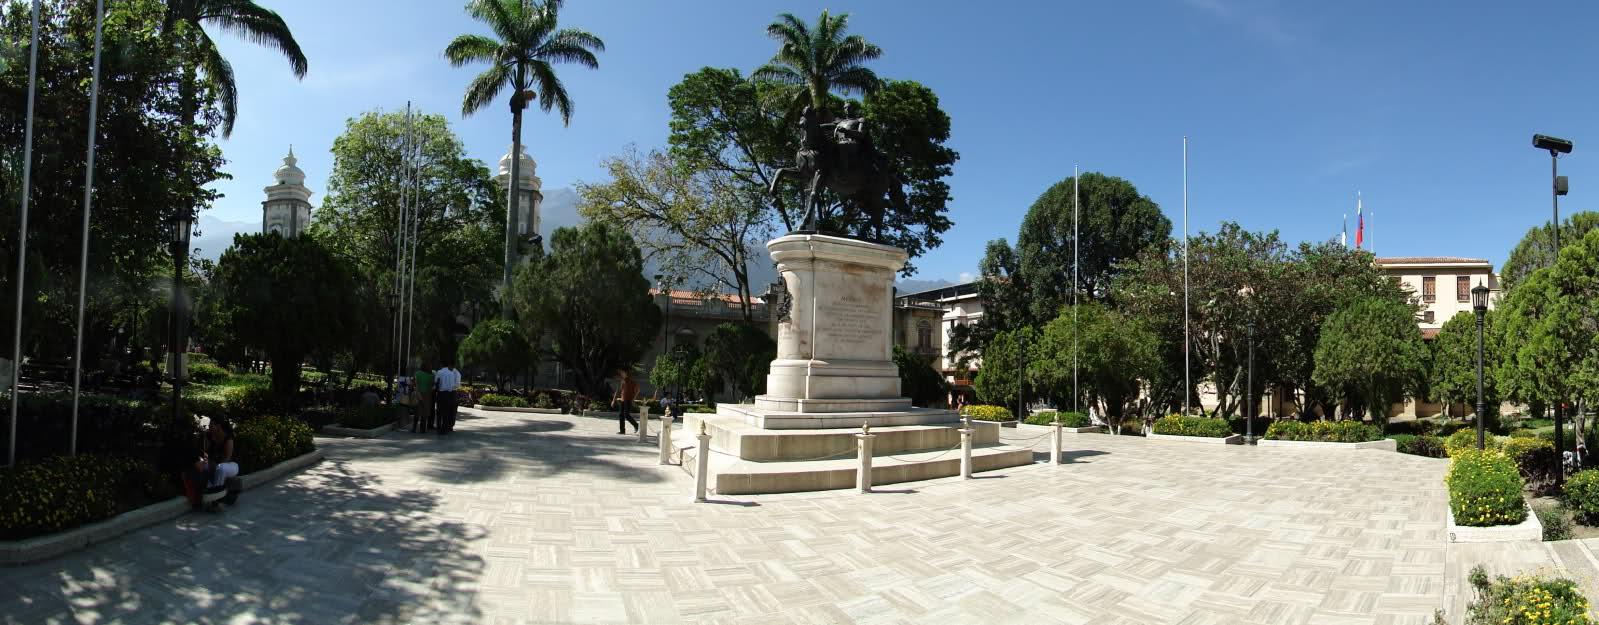 El fragor de la guerra independentista en la Mérida de 1813